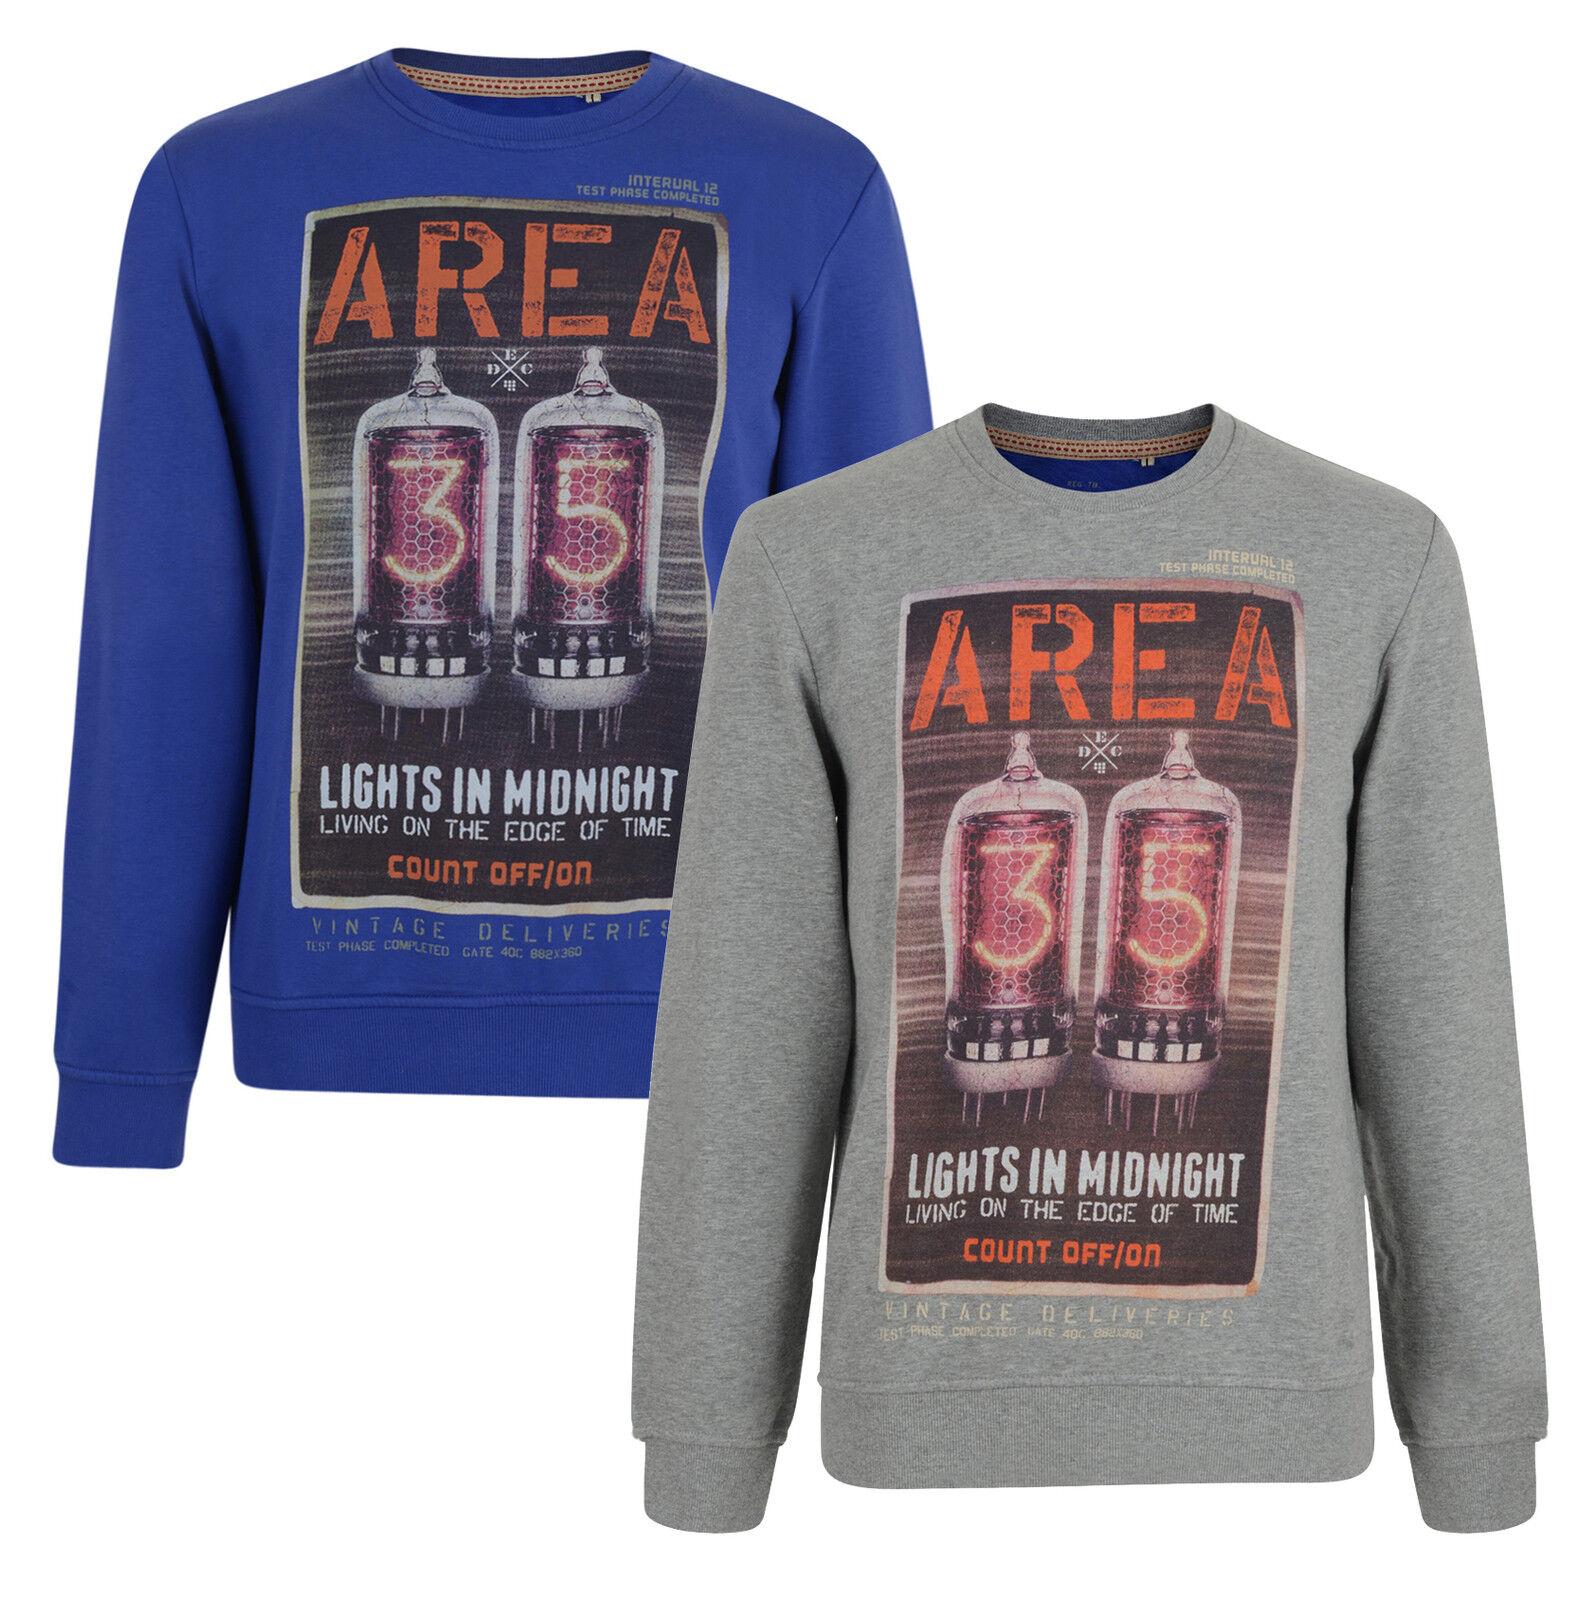 EDC by Esprit Mens Sweatshirt Printed Graphic Blue & Grey Top S M L XL XXL